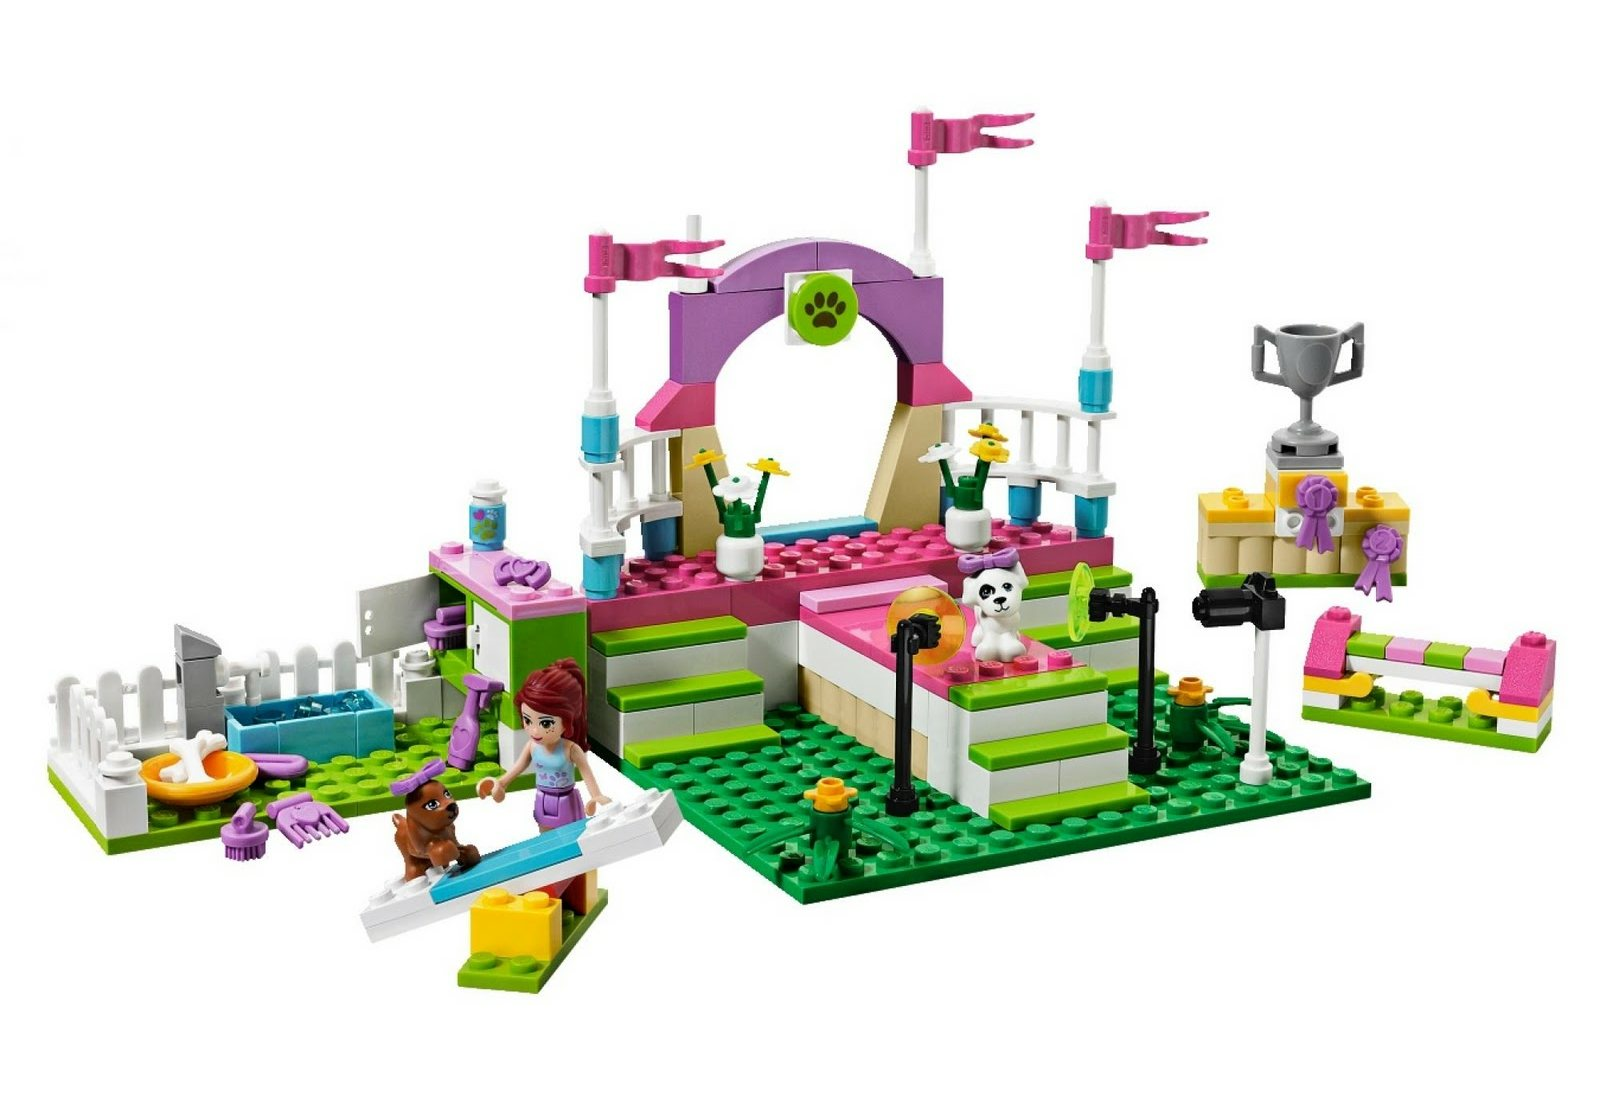 Brick Friends: LEGO 3942 Heartlake Dog Show